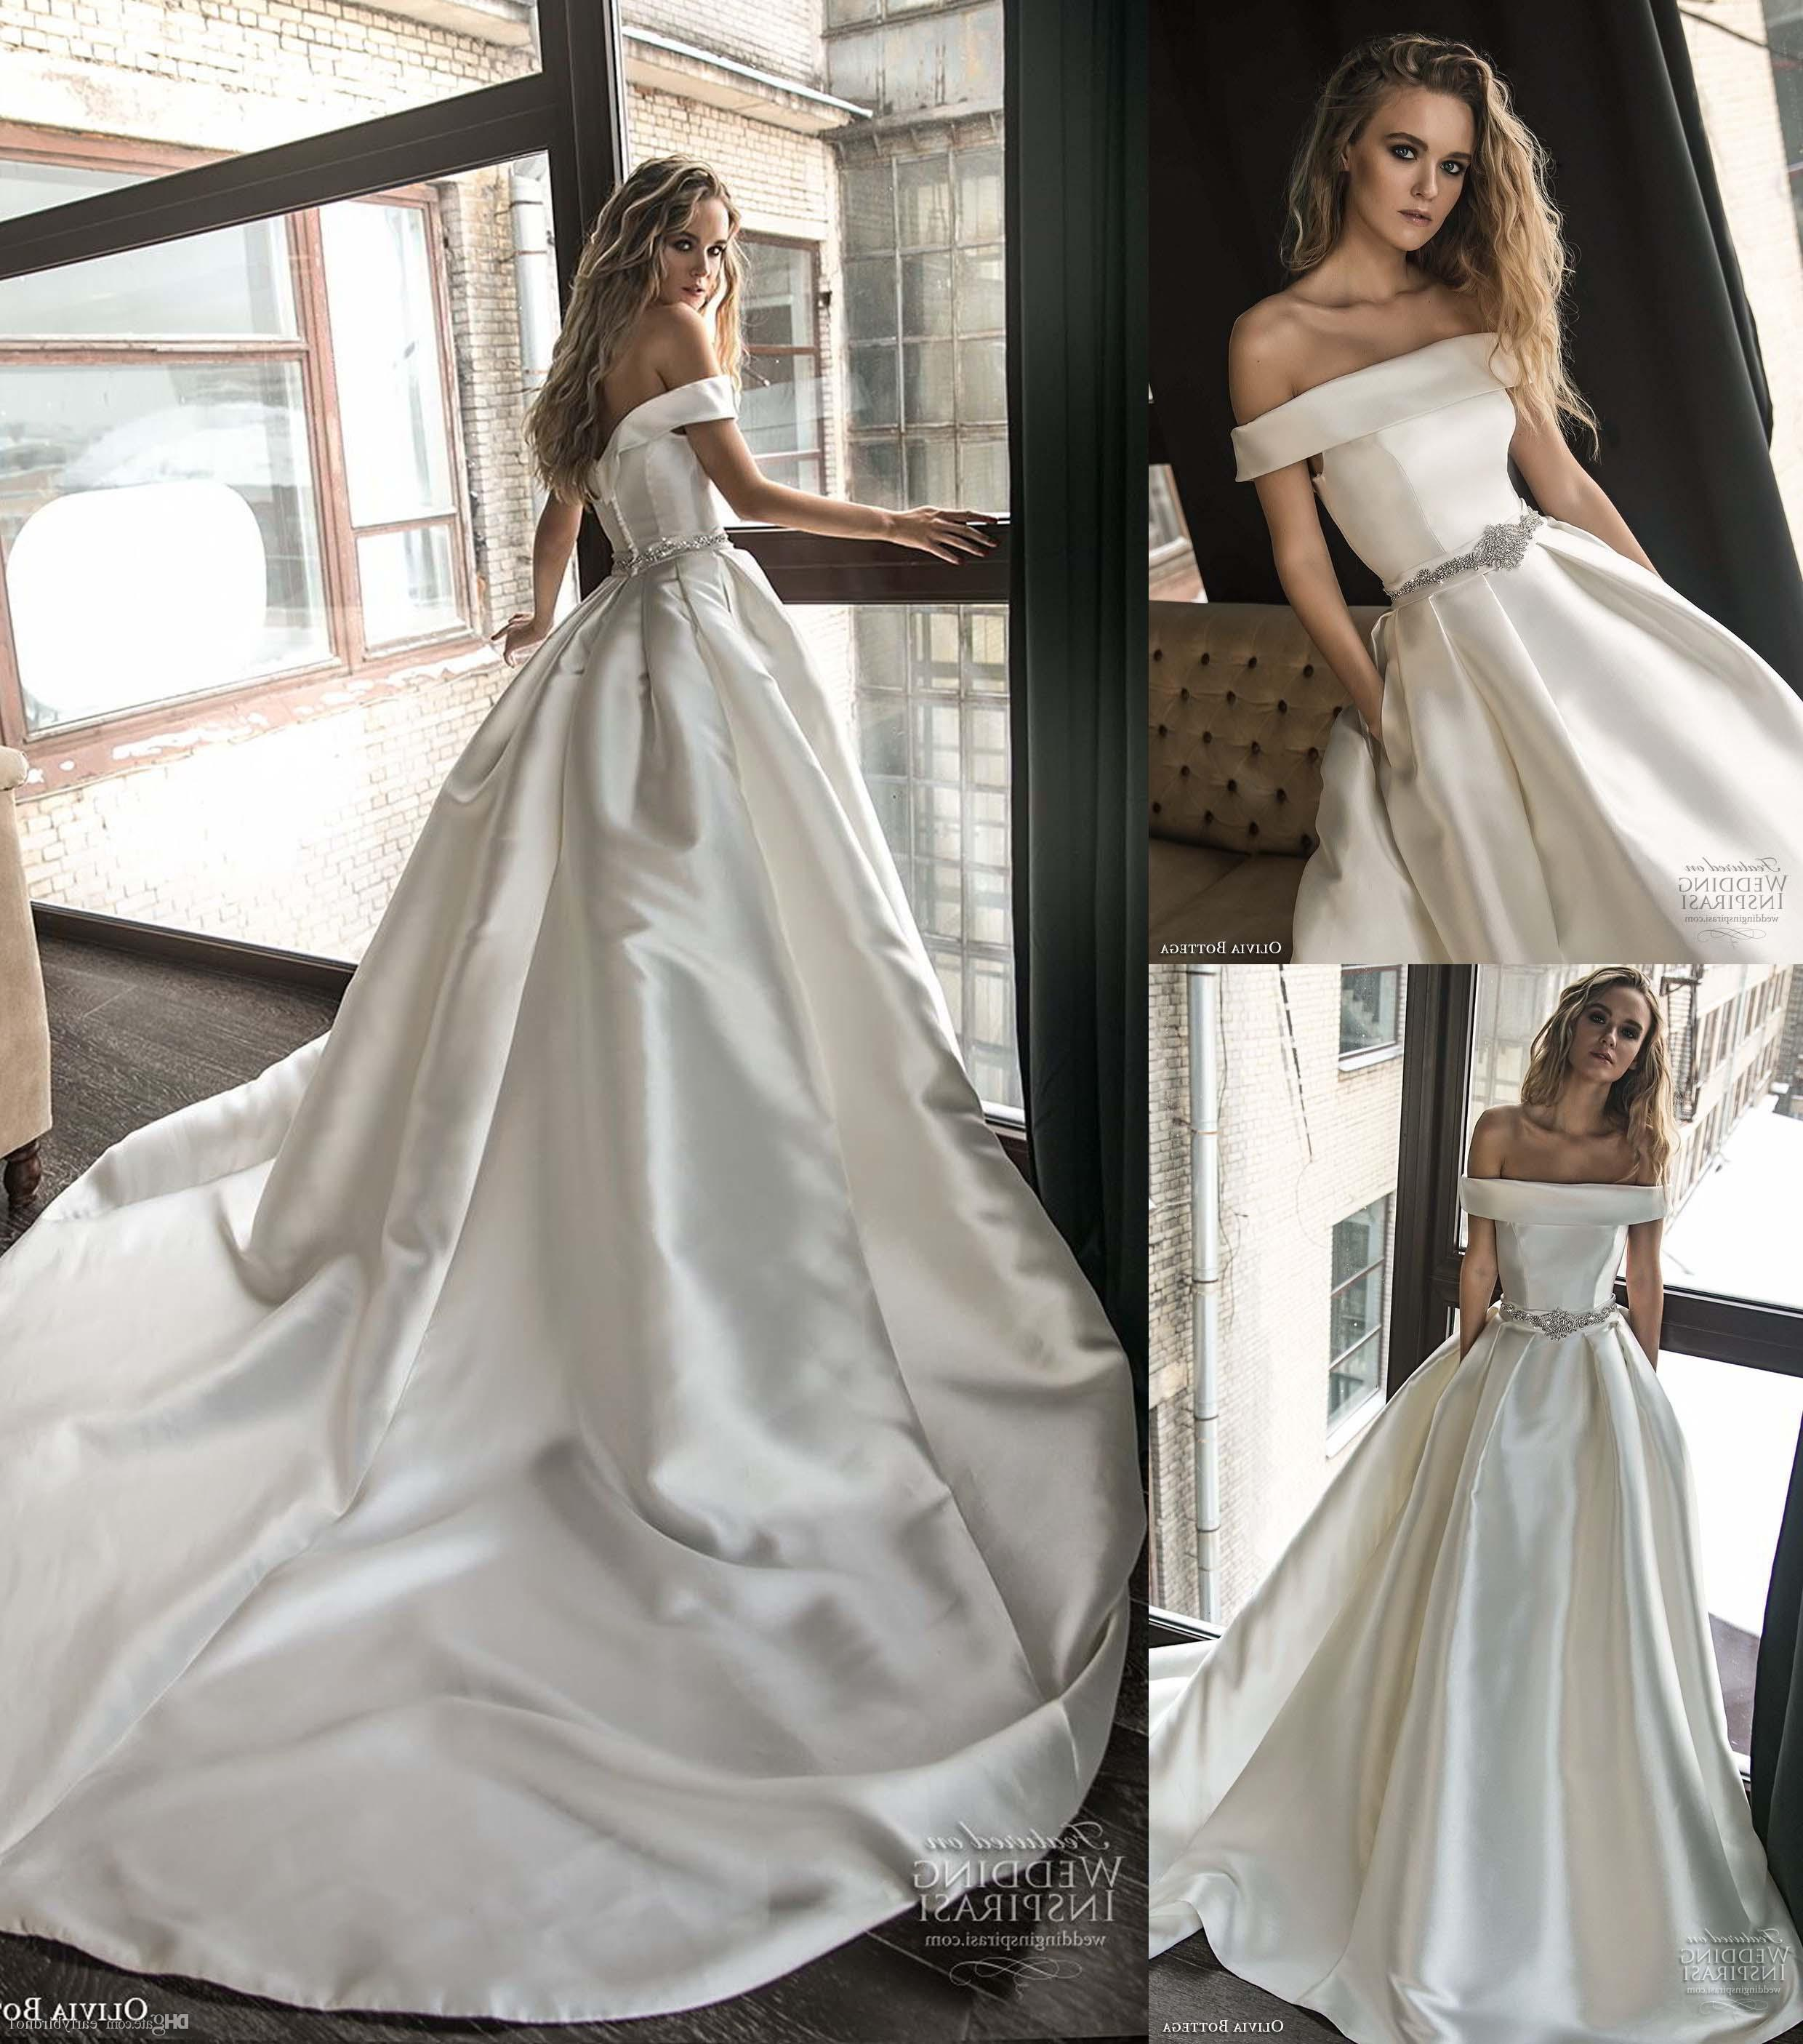 Inspirasi Hijab Bridesmaid Dress Jxdu Wedding Ideas A Line Lace Wedding Dress Eye Popping